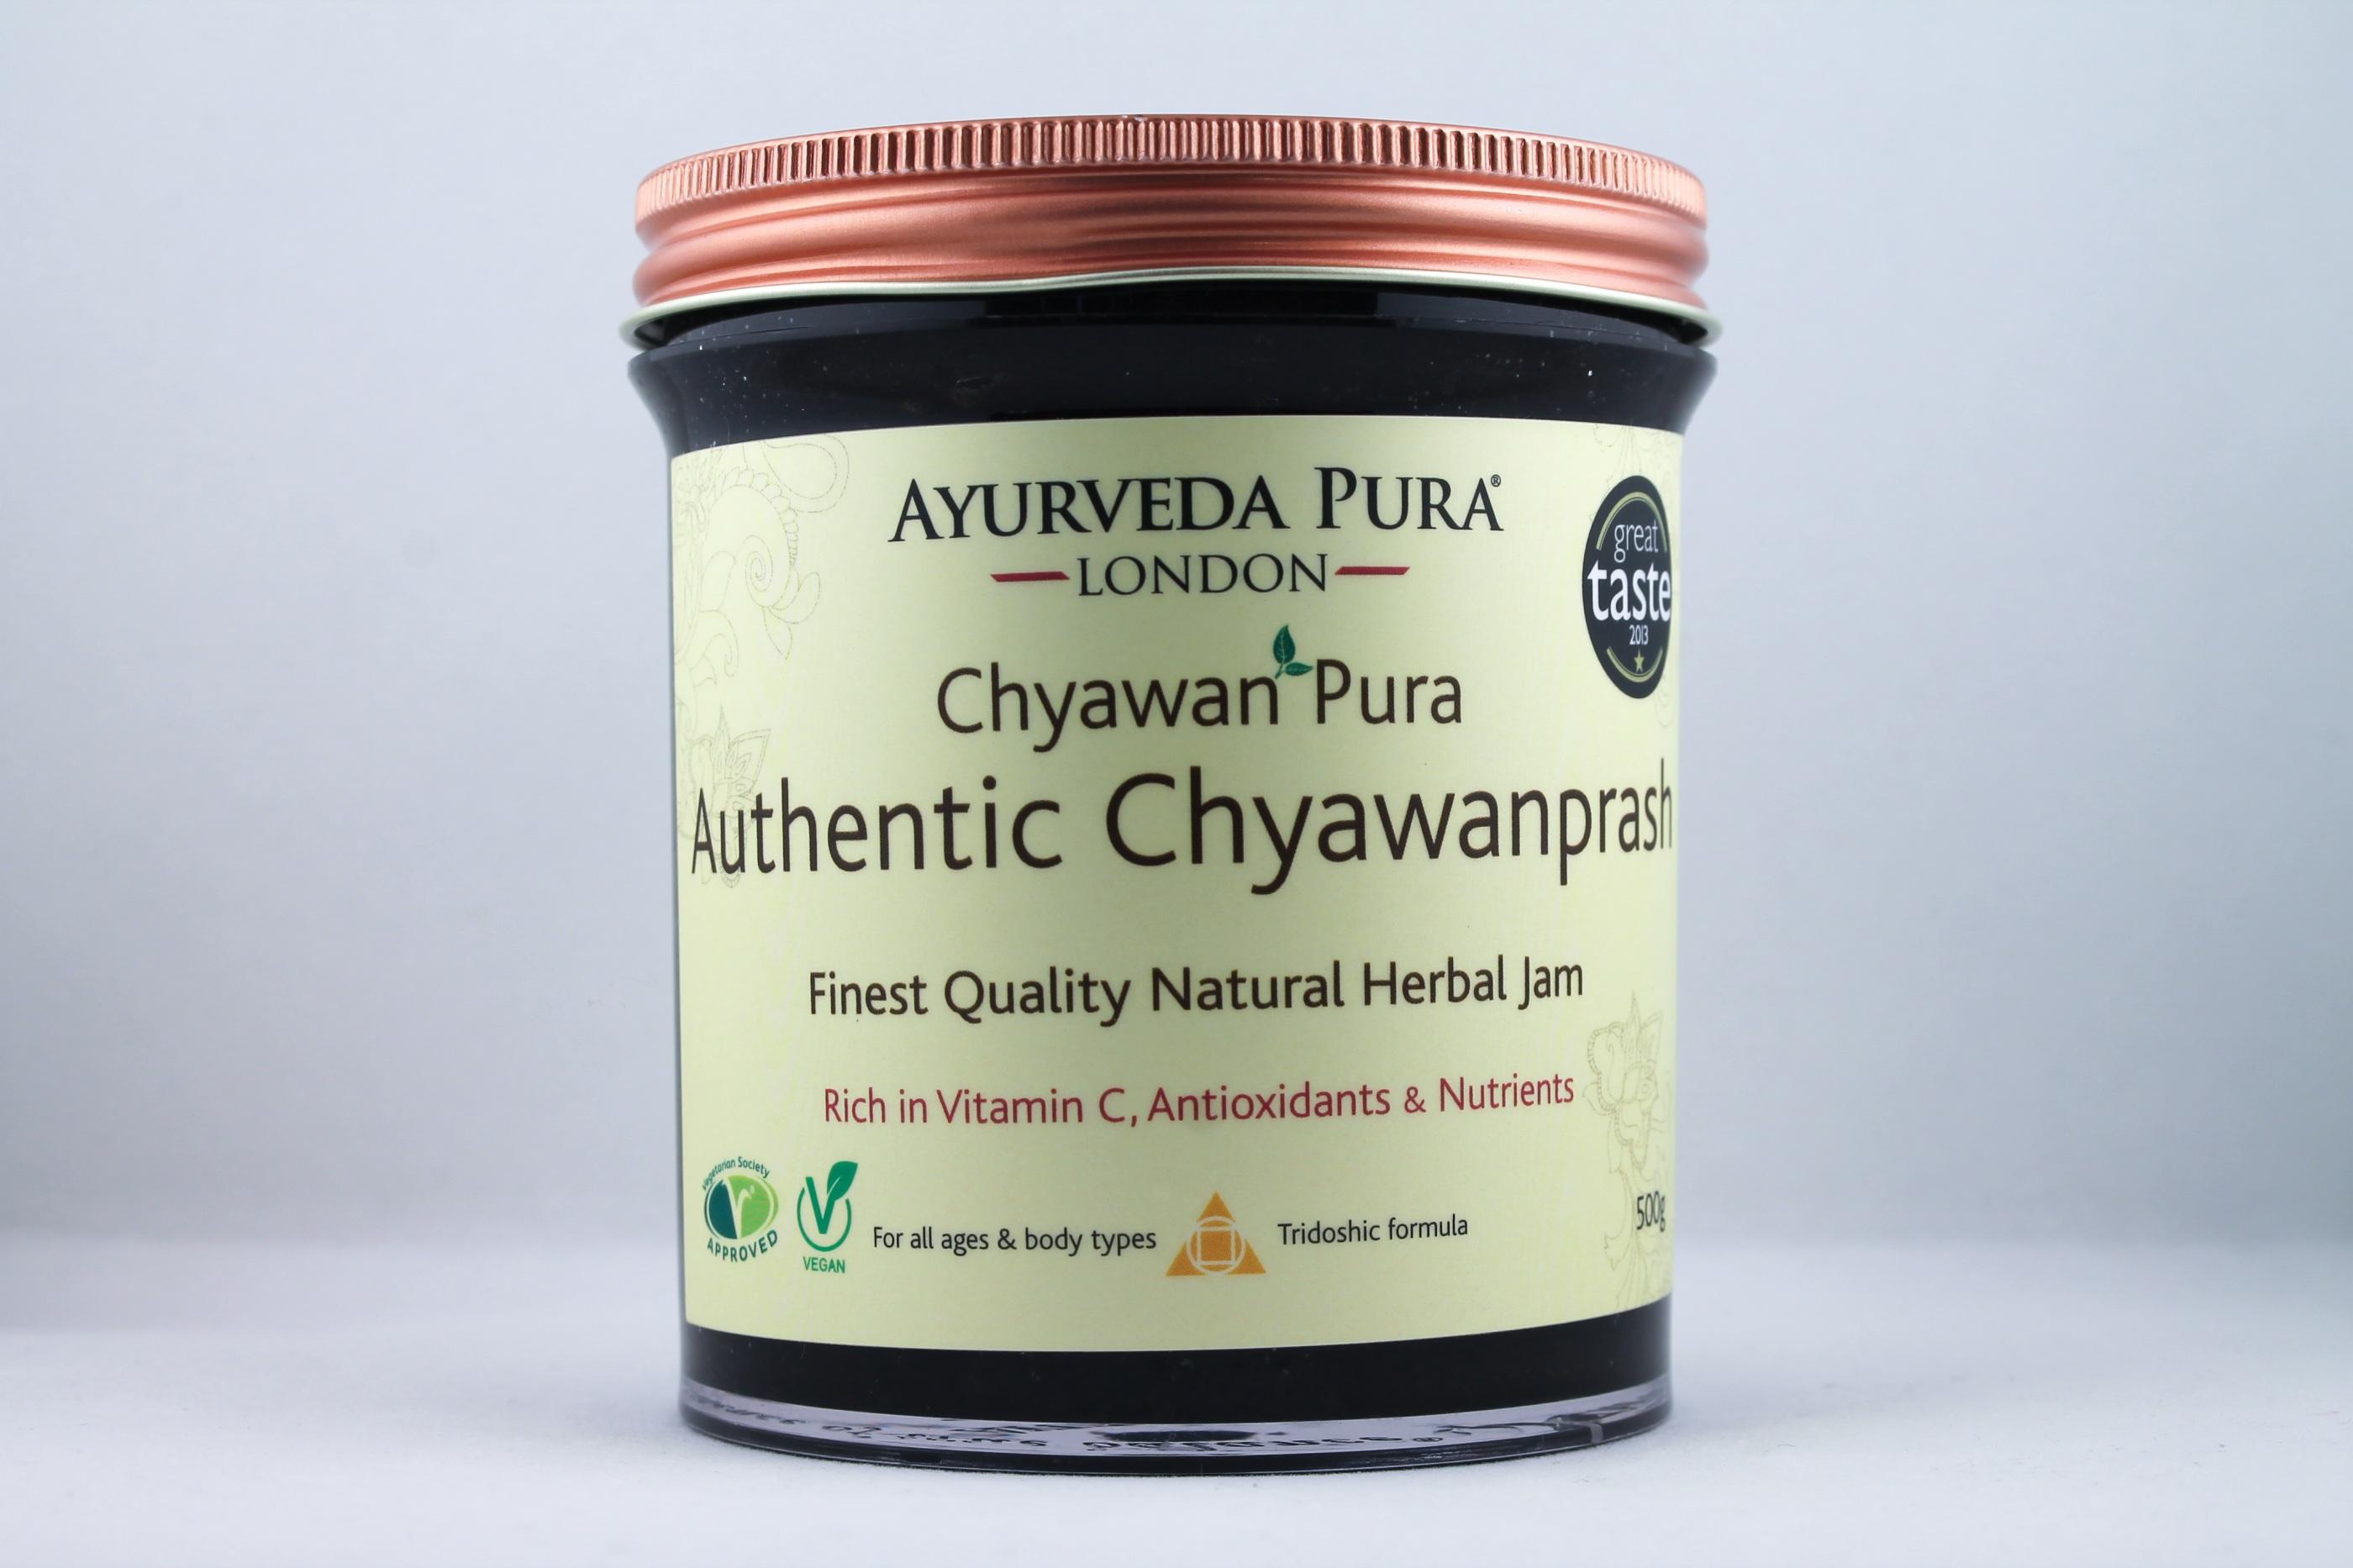 Chyavanprash Chyawanprash holistisk homeopati alternativ hälsa Wellness Ayurveda Halmstadmassören Halmstad Sverige Sweden svensk